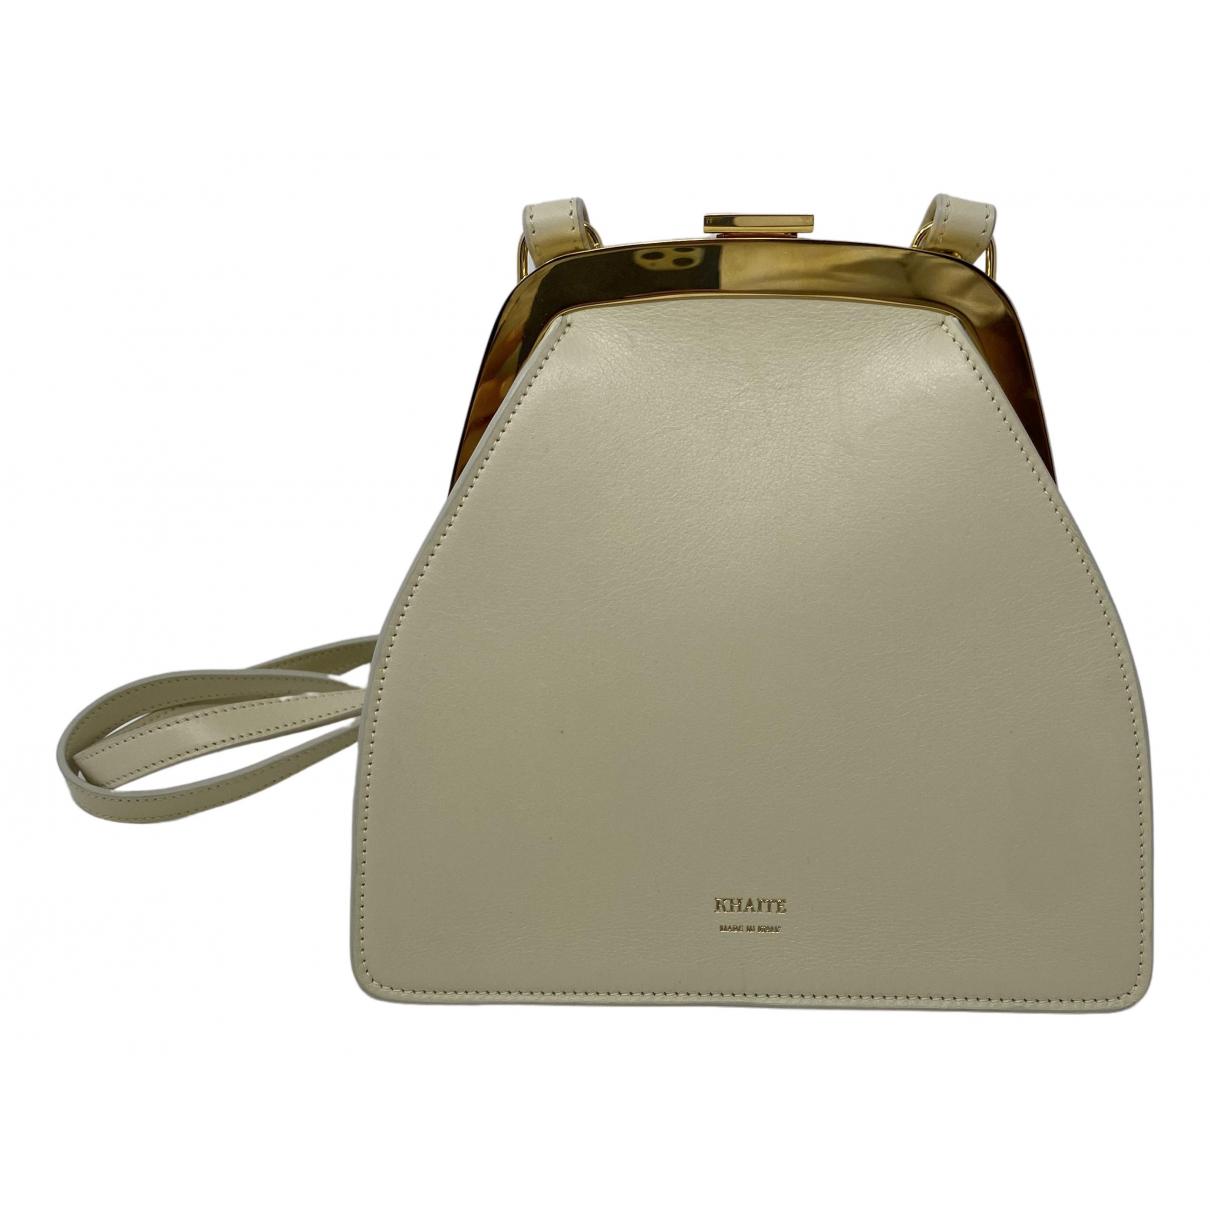 Khaite \N Ecru Leather handbag for Women \N